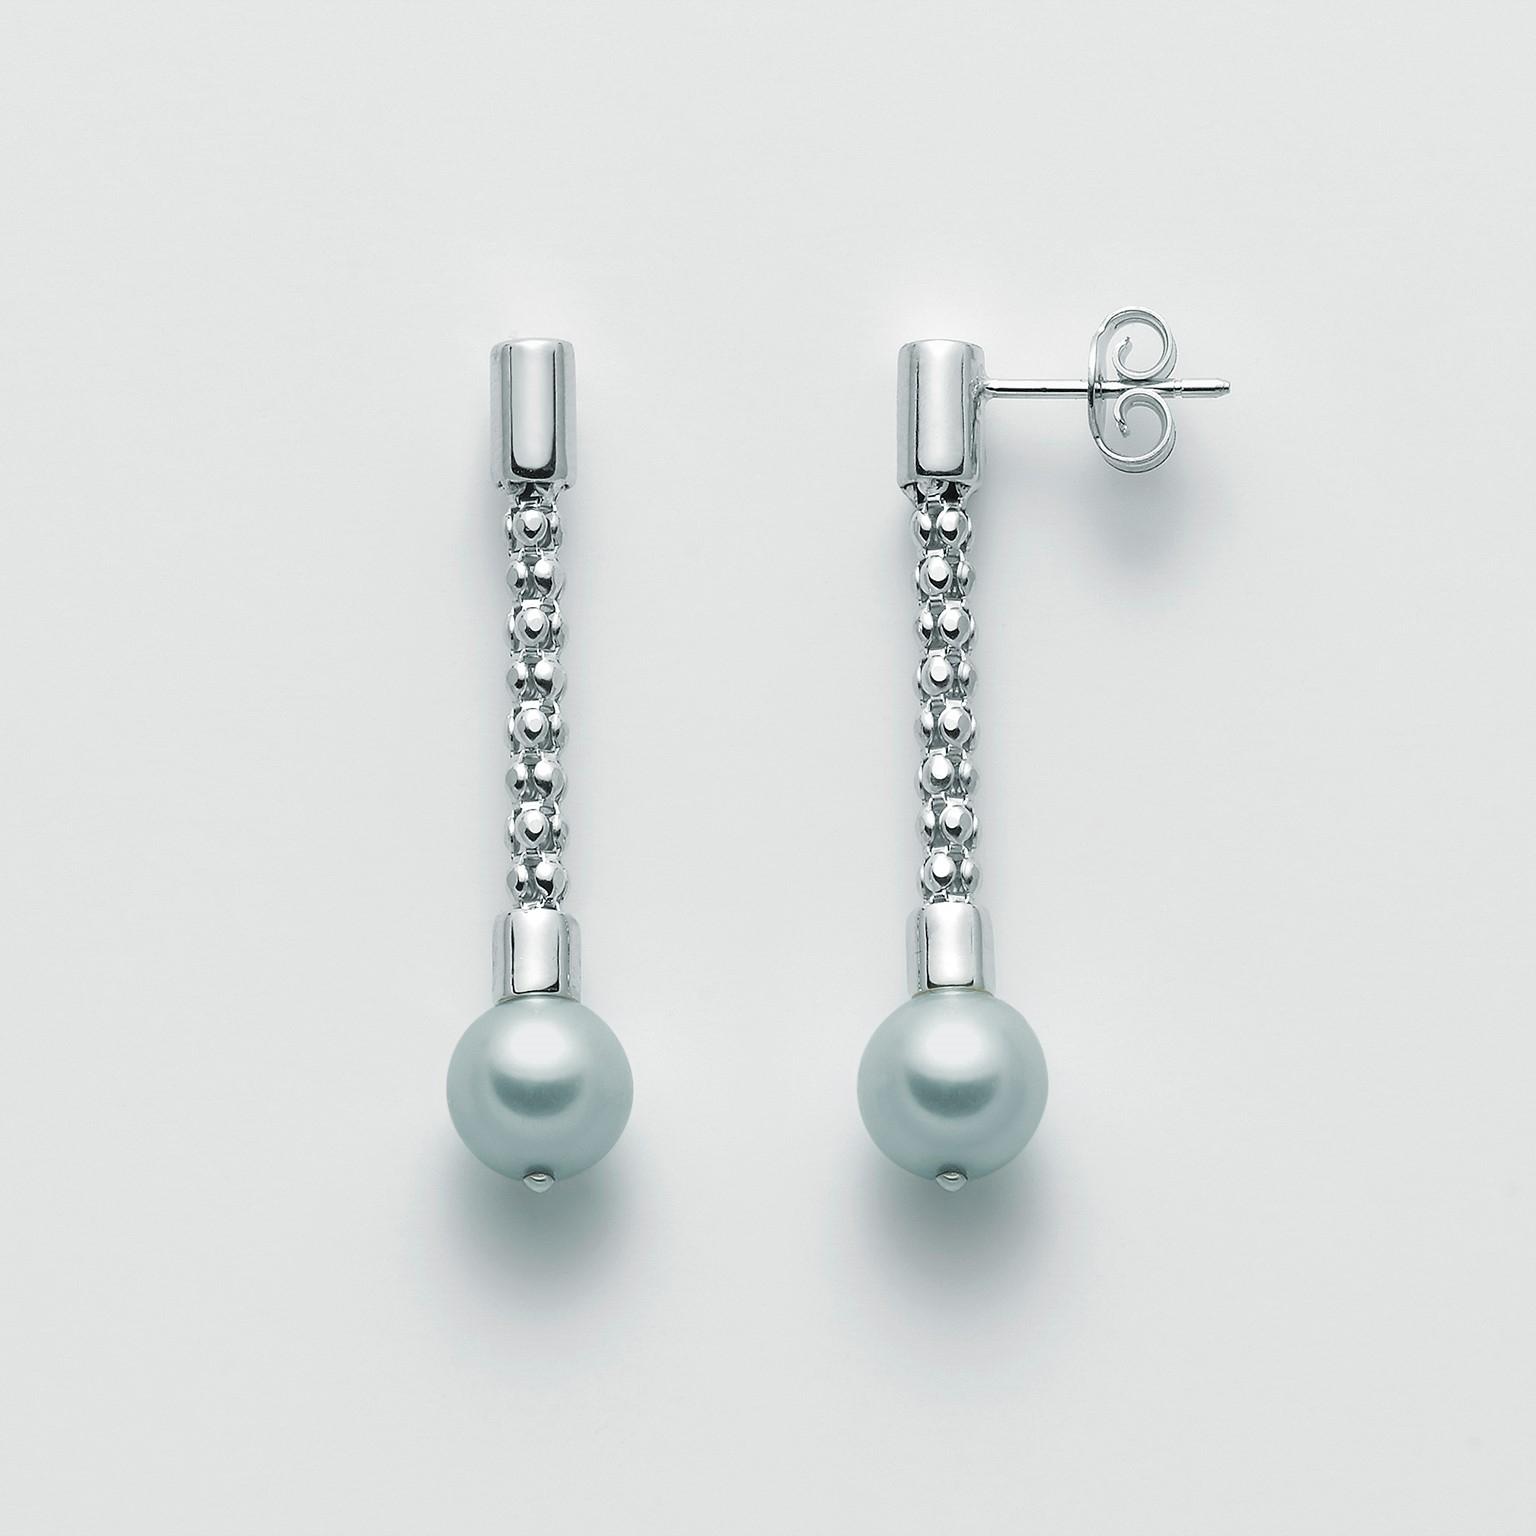 MILUNA-Orecchini di perle in  argento